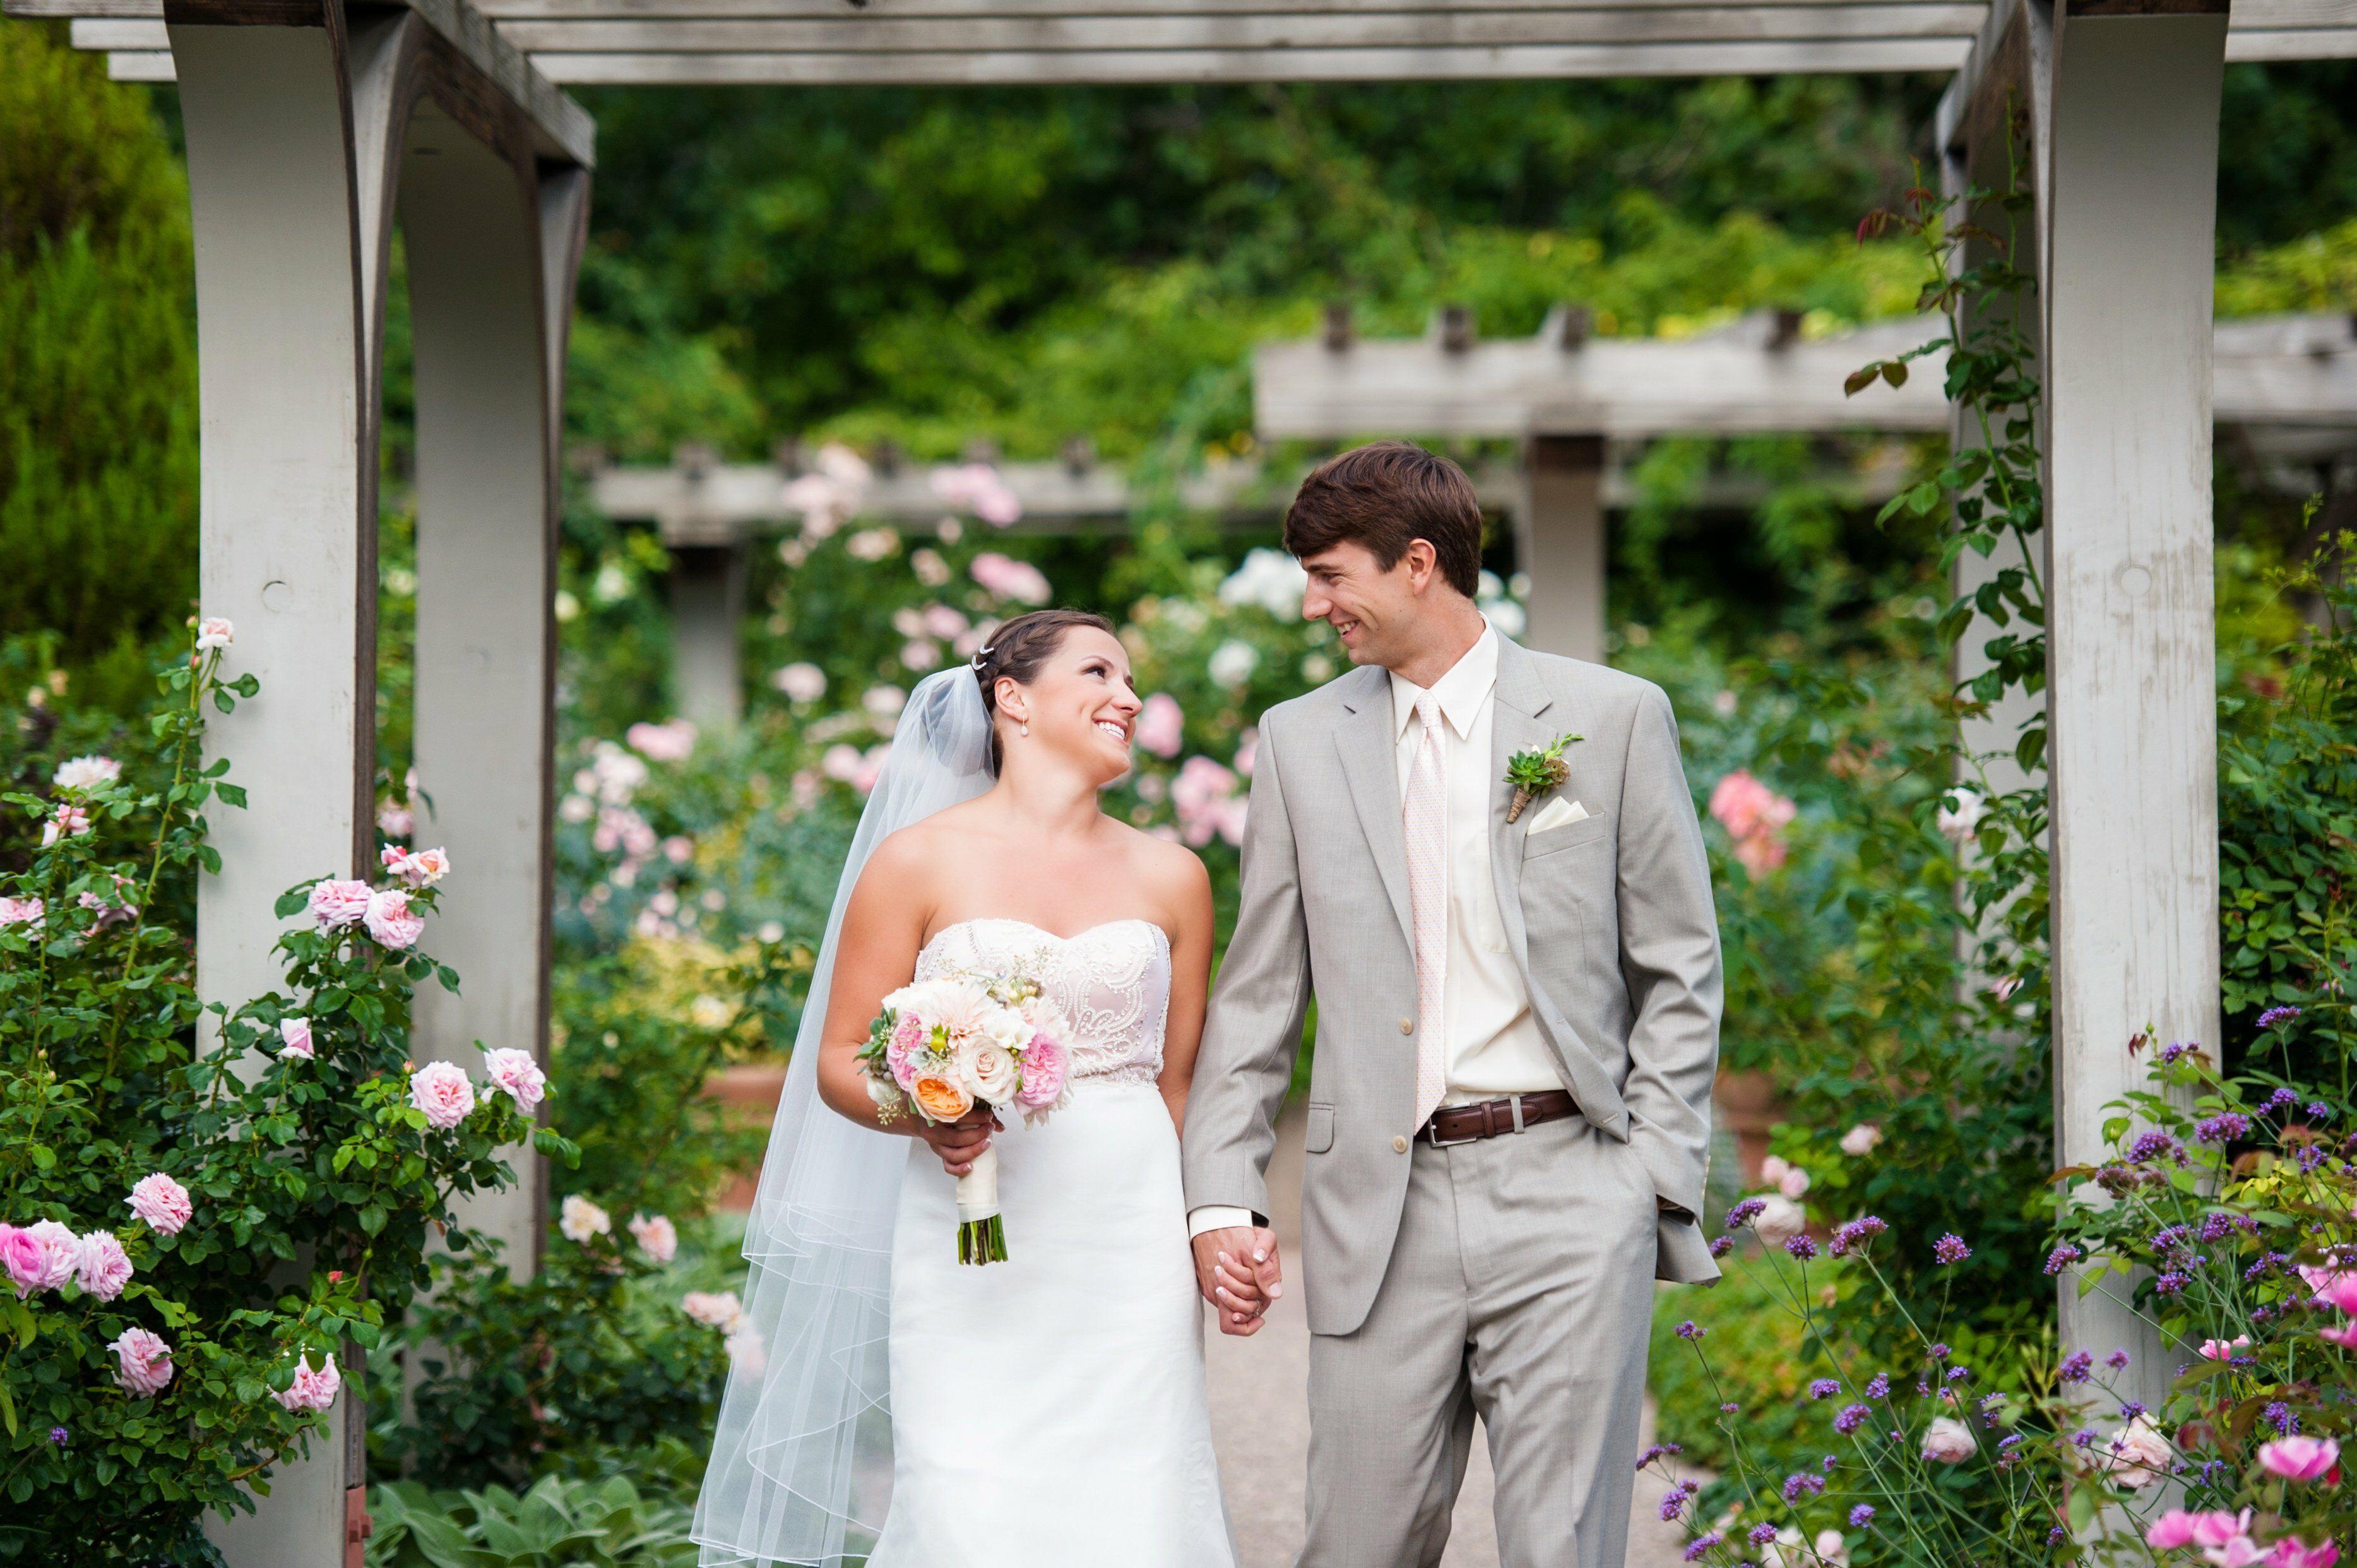 A Traditional Wedding at The Denver Botanic Gardens in Denver